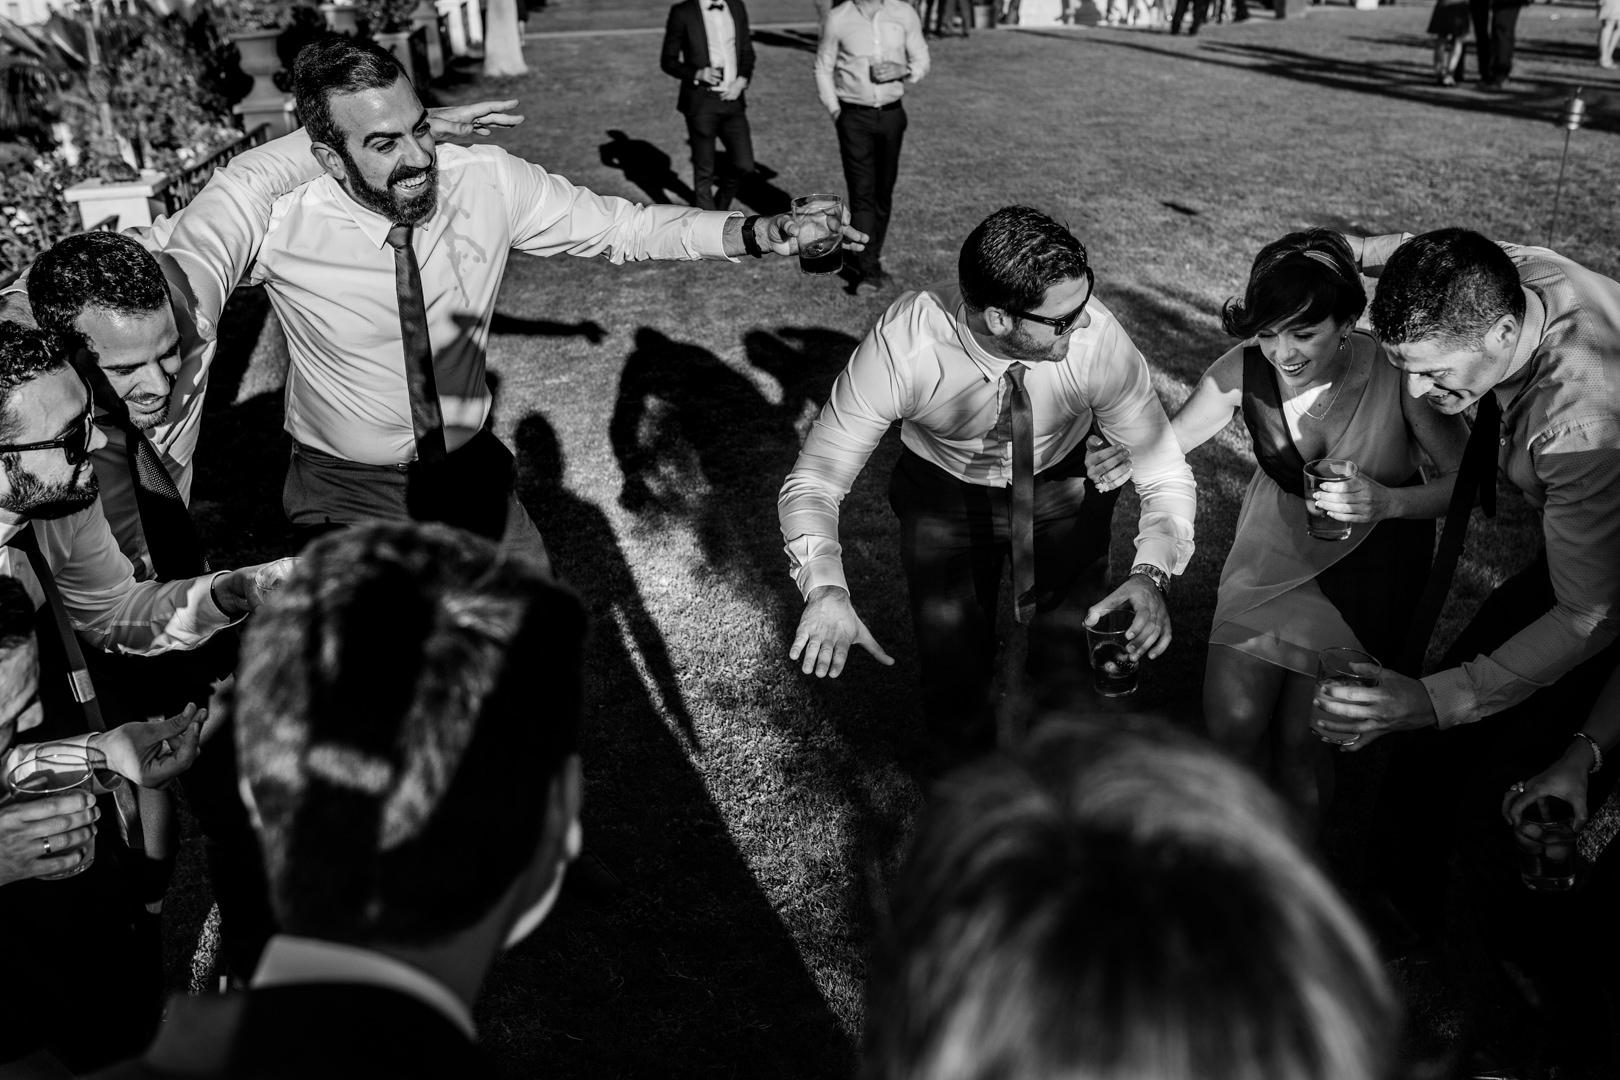 Boda-Catedral-Jaen-Hamburgo-Maria-David-engagement-Rafael-Torres-fotografo-bodas-sevilla-madrid-barcelona-wedding-photographer--49.jpg